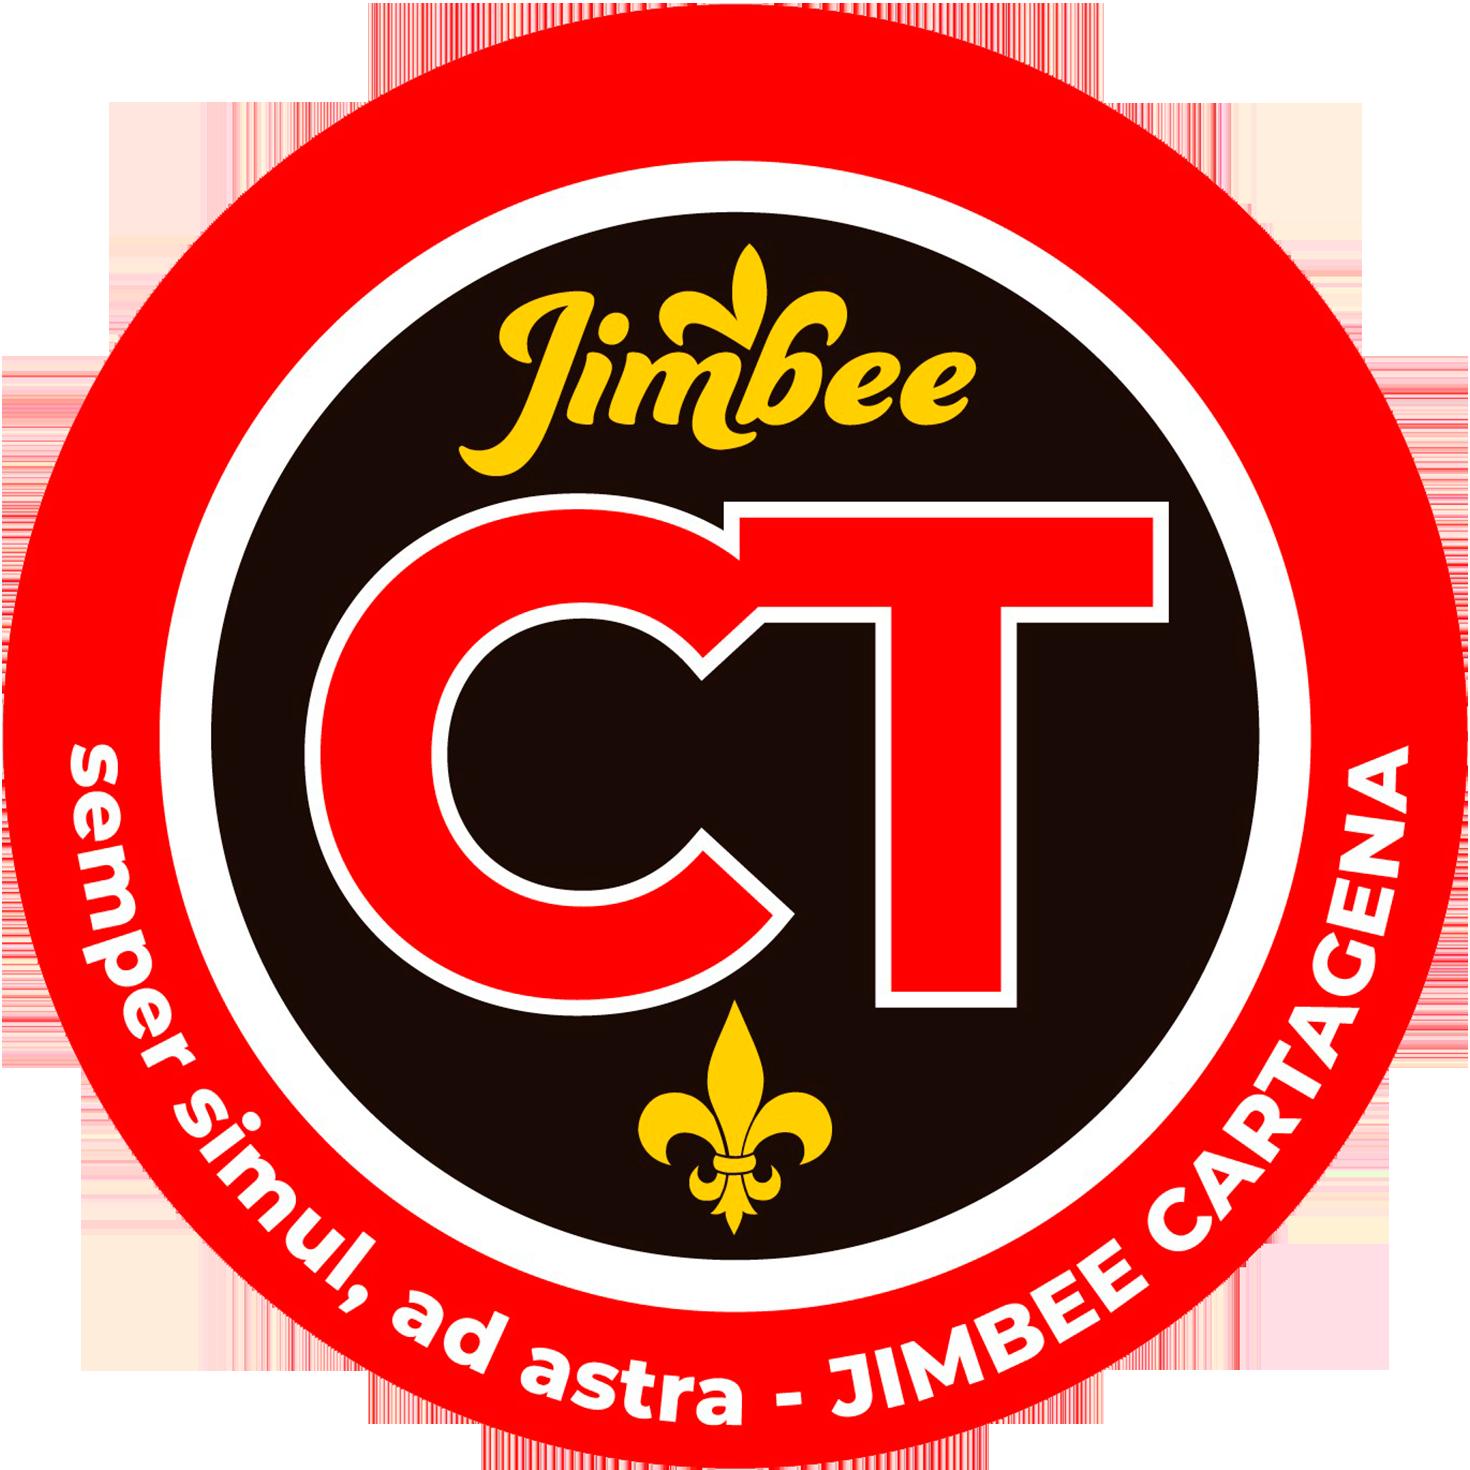 Jimbee Cartagena | Web Oficial